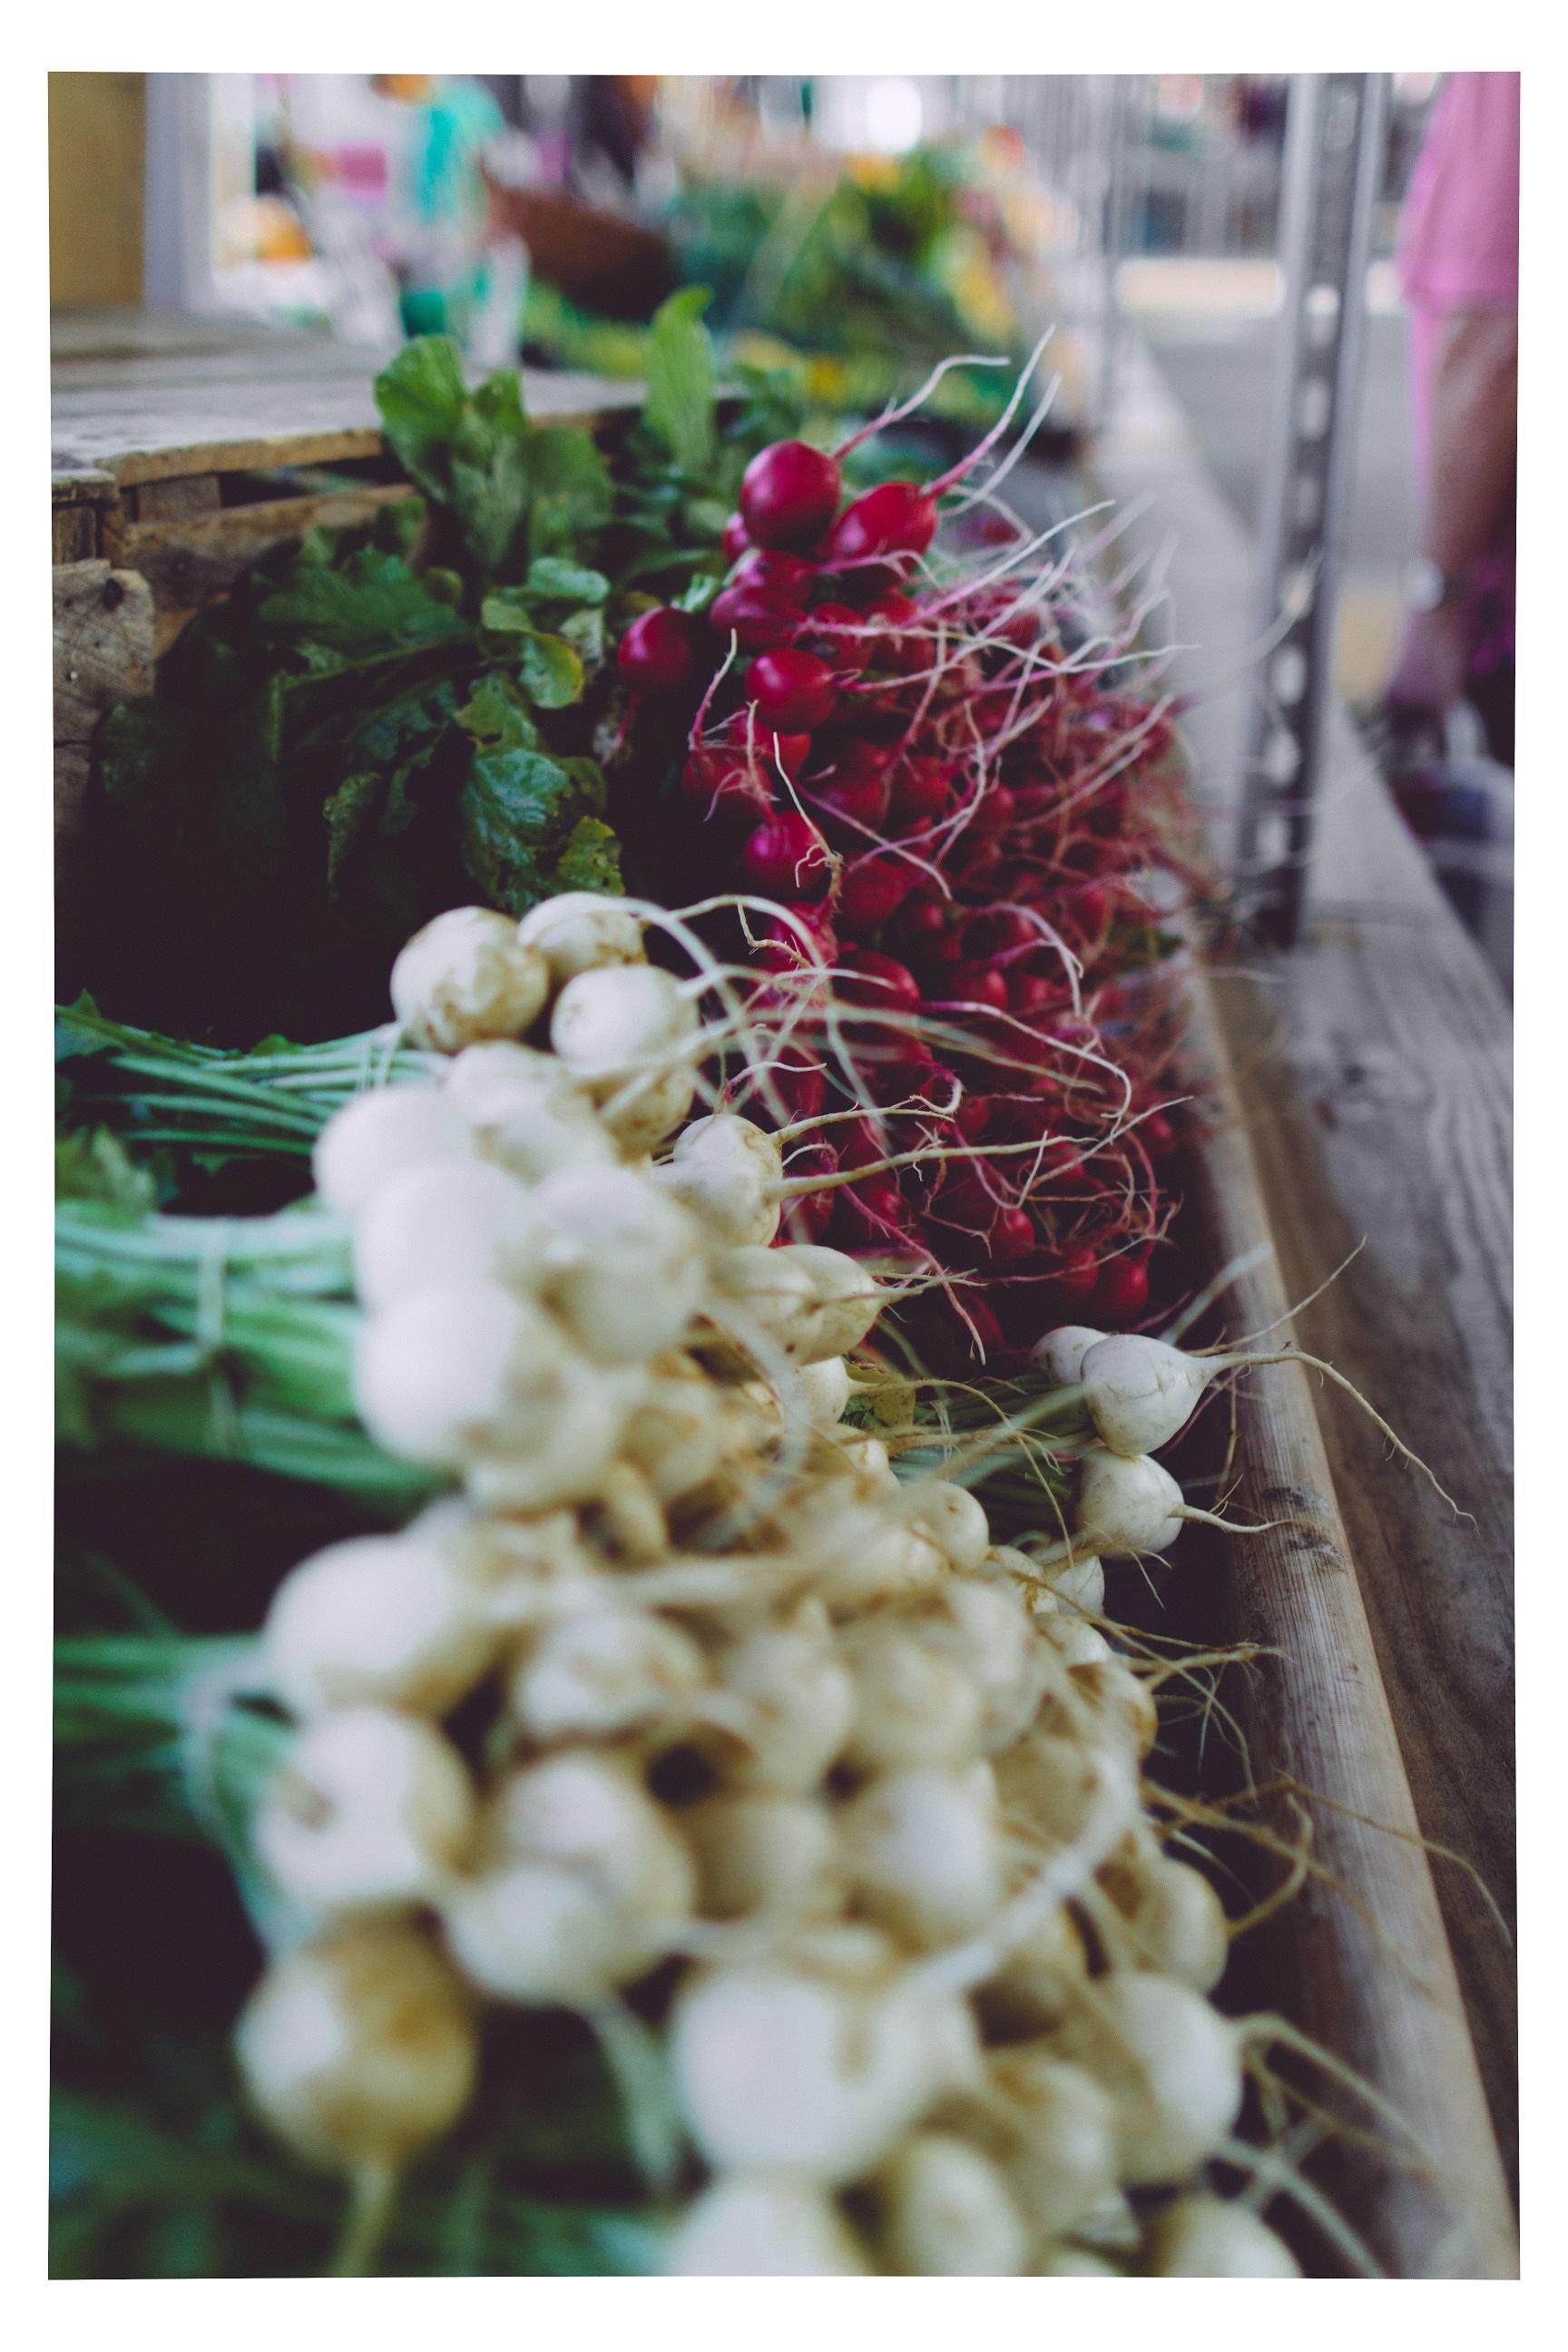 Vegetables from Blandford Farm